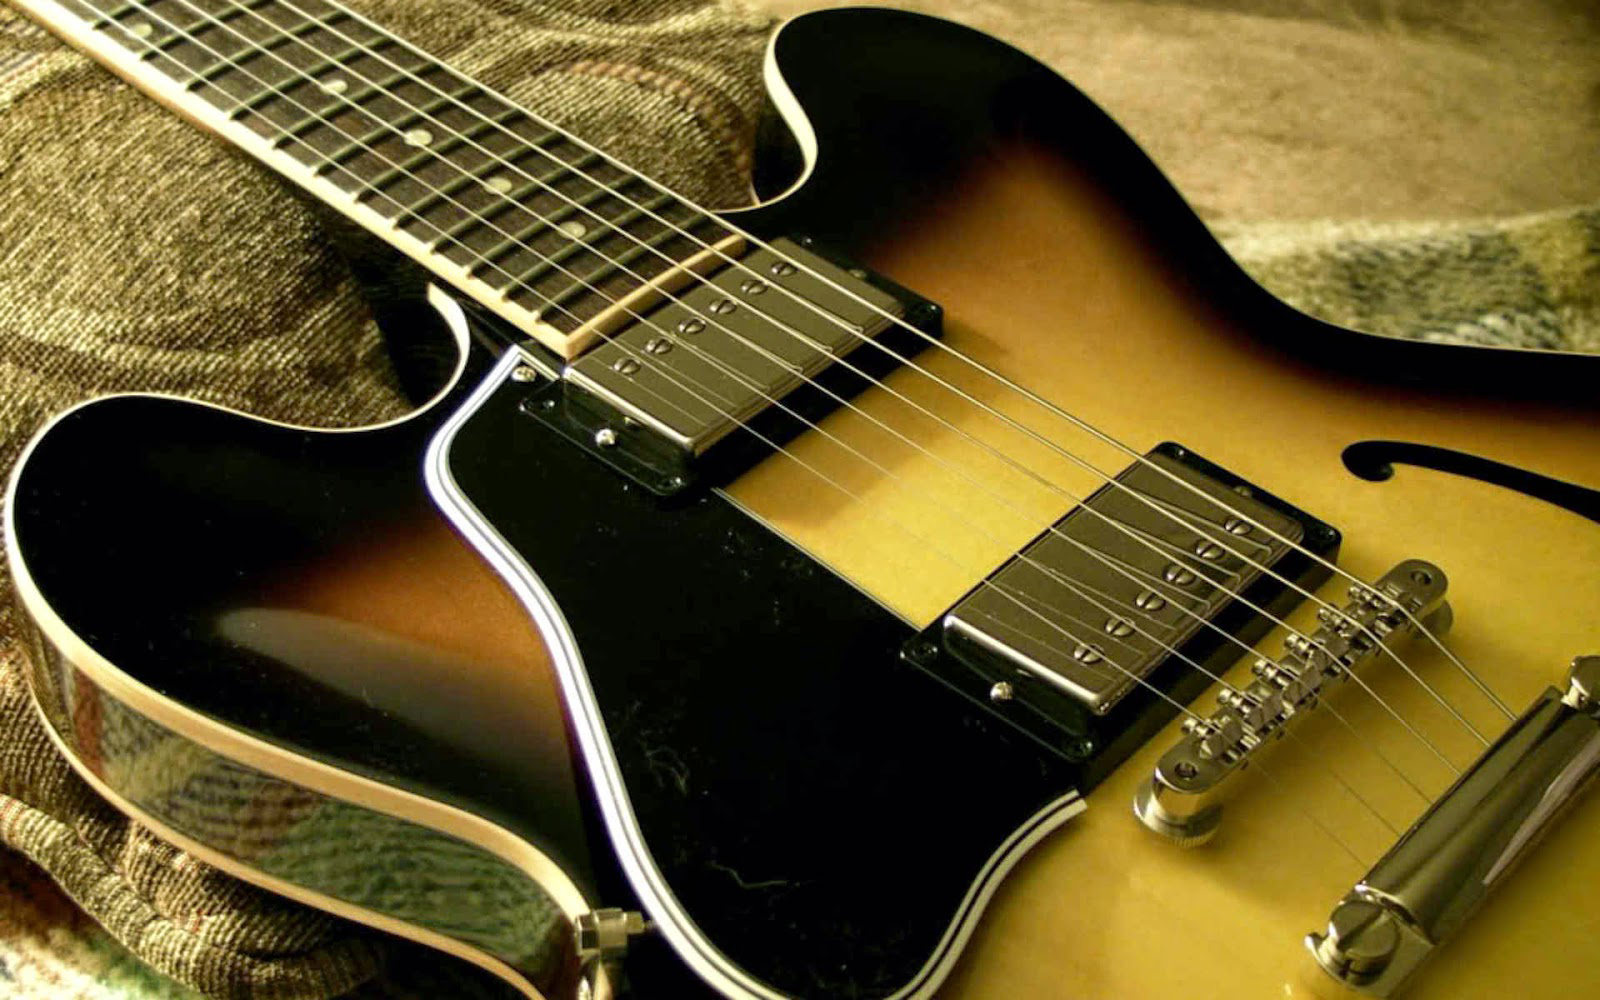 Classical Guitar Wallpaper Hd